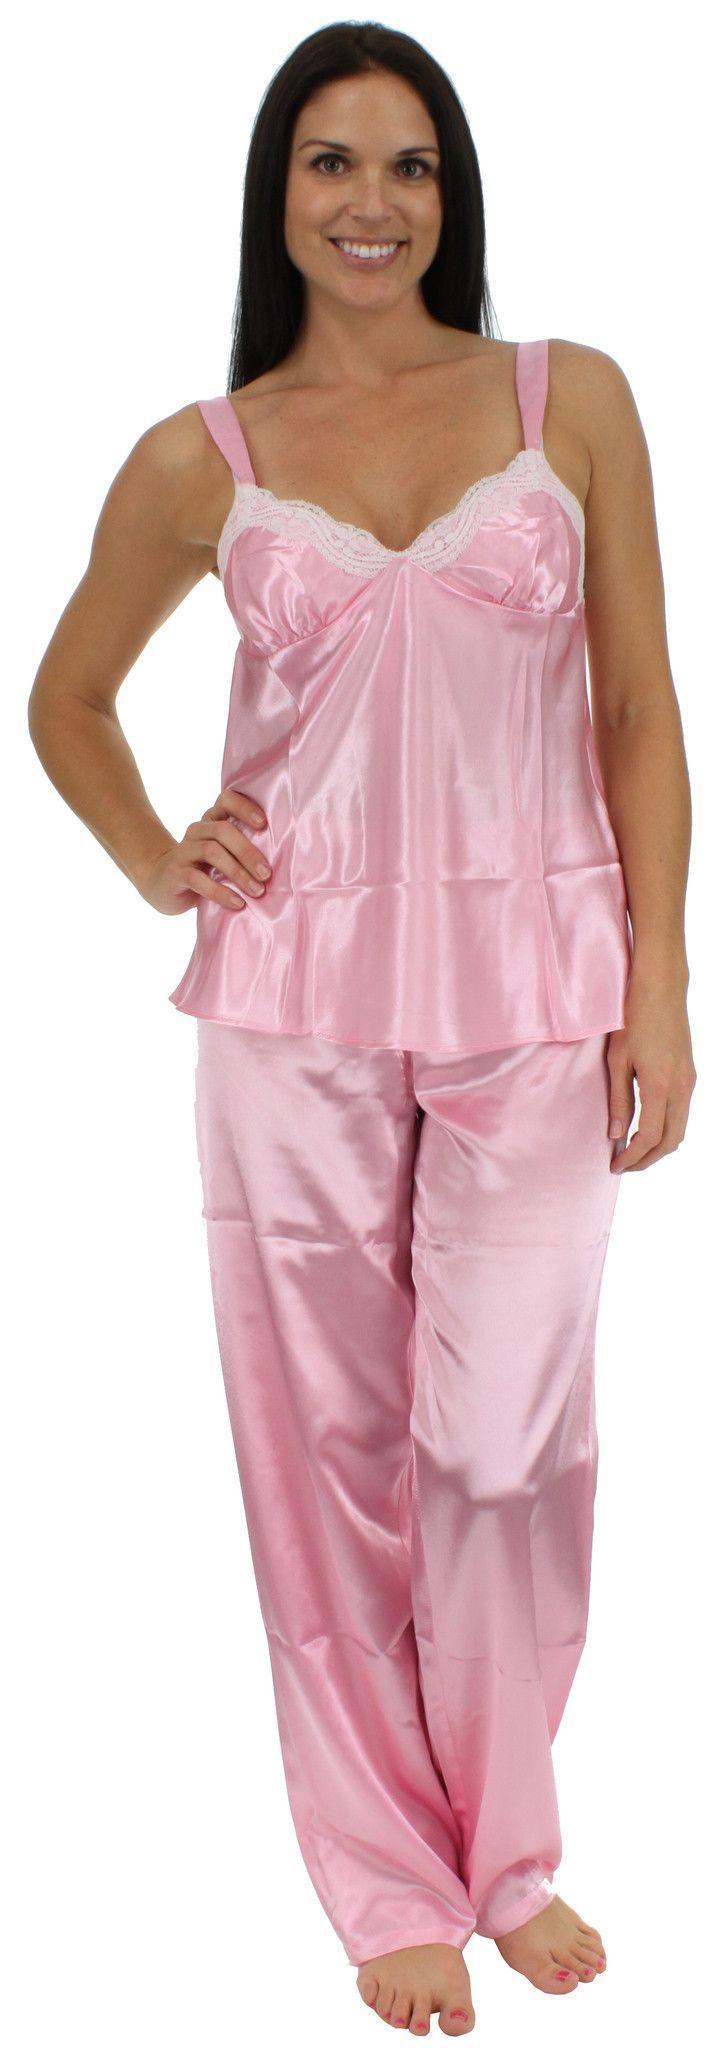 Pajama Heaven Women\'s Satin Camisole and Pant Set